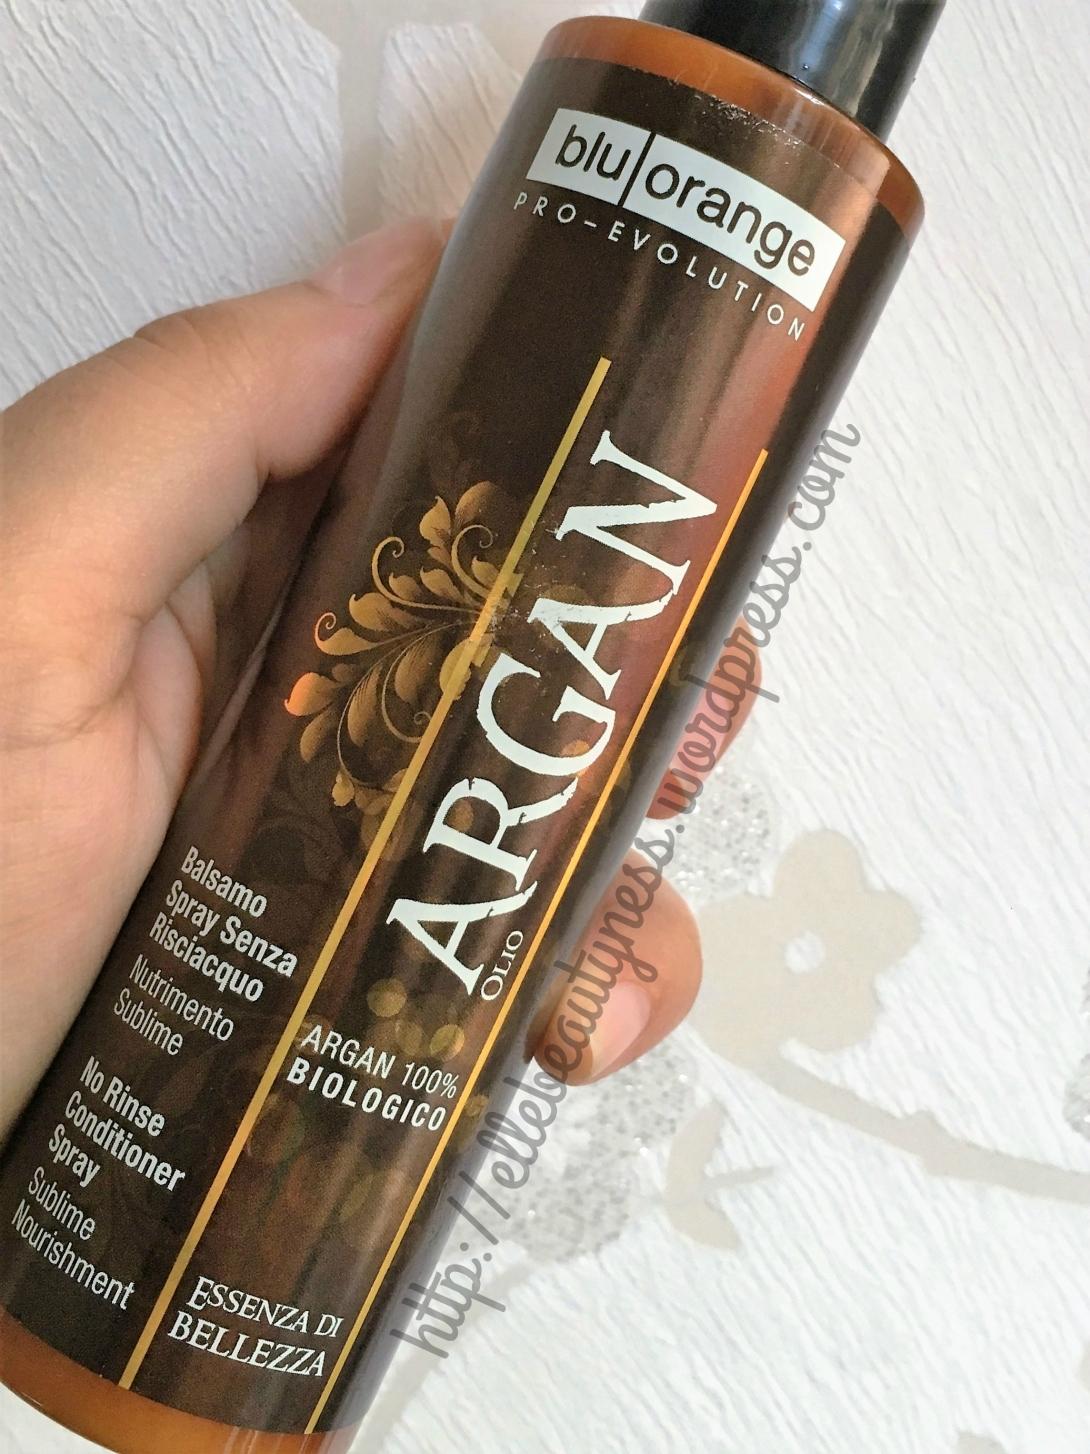 balsamo no risciacquo argan keratin cheratina shampoo maschera olio cristalli pure blu orange review recensione elle beautyness .jpg